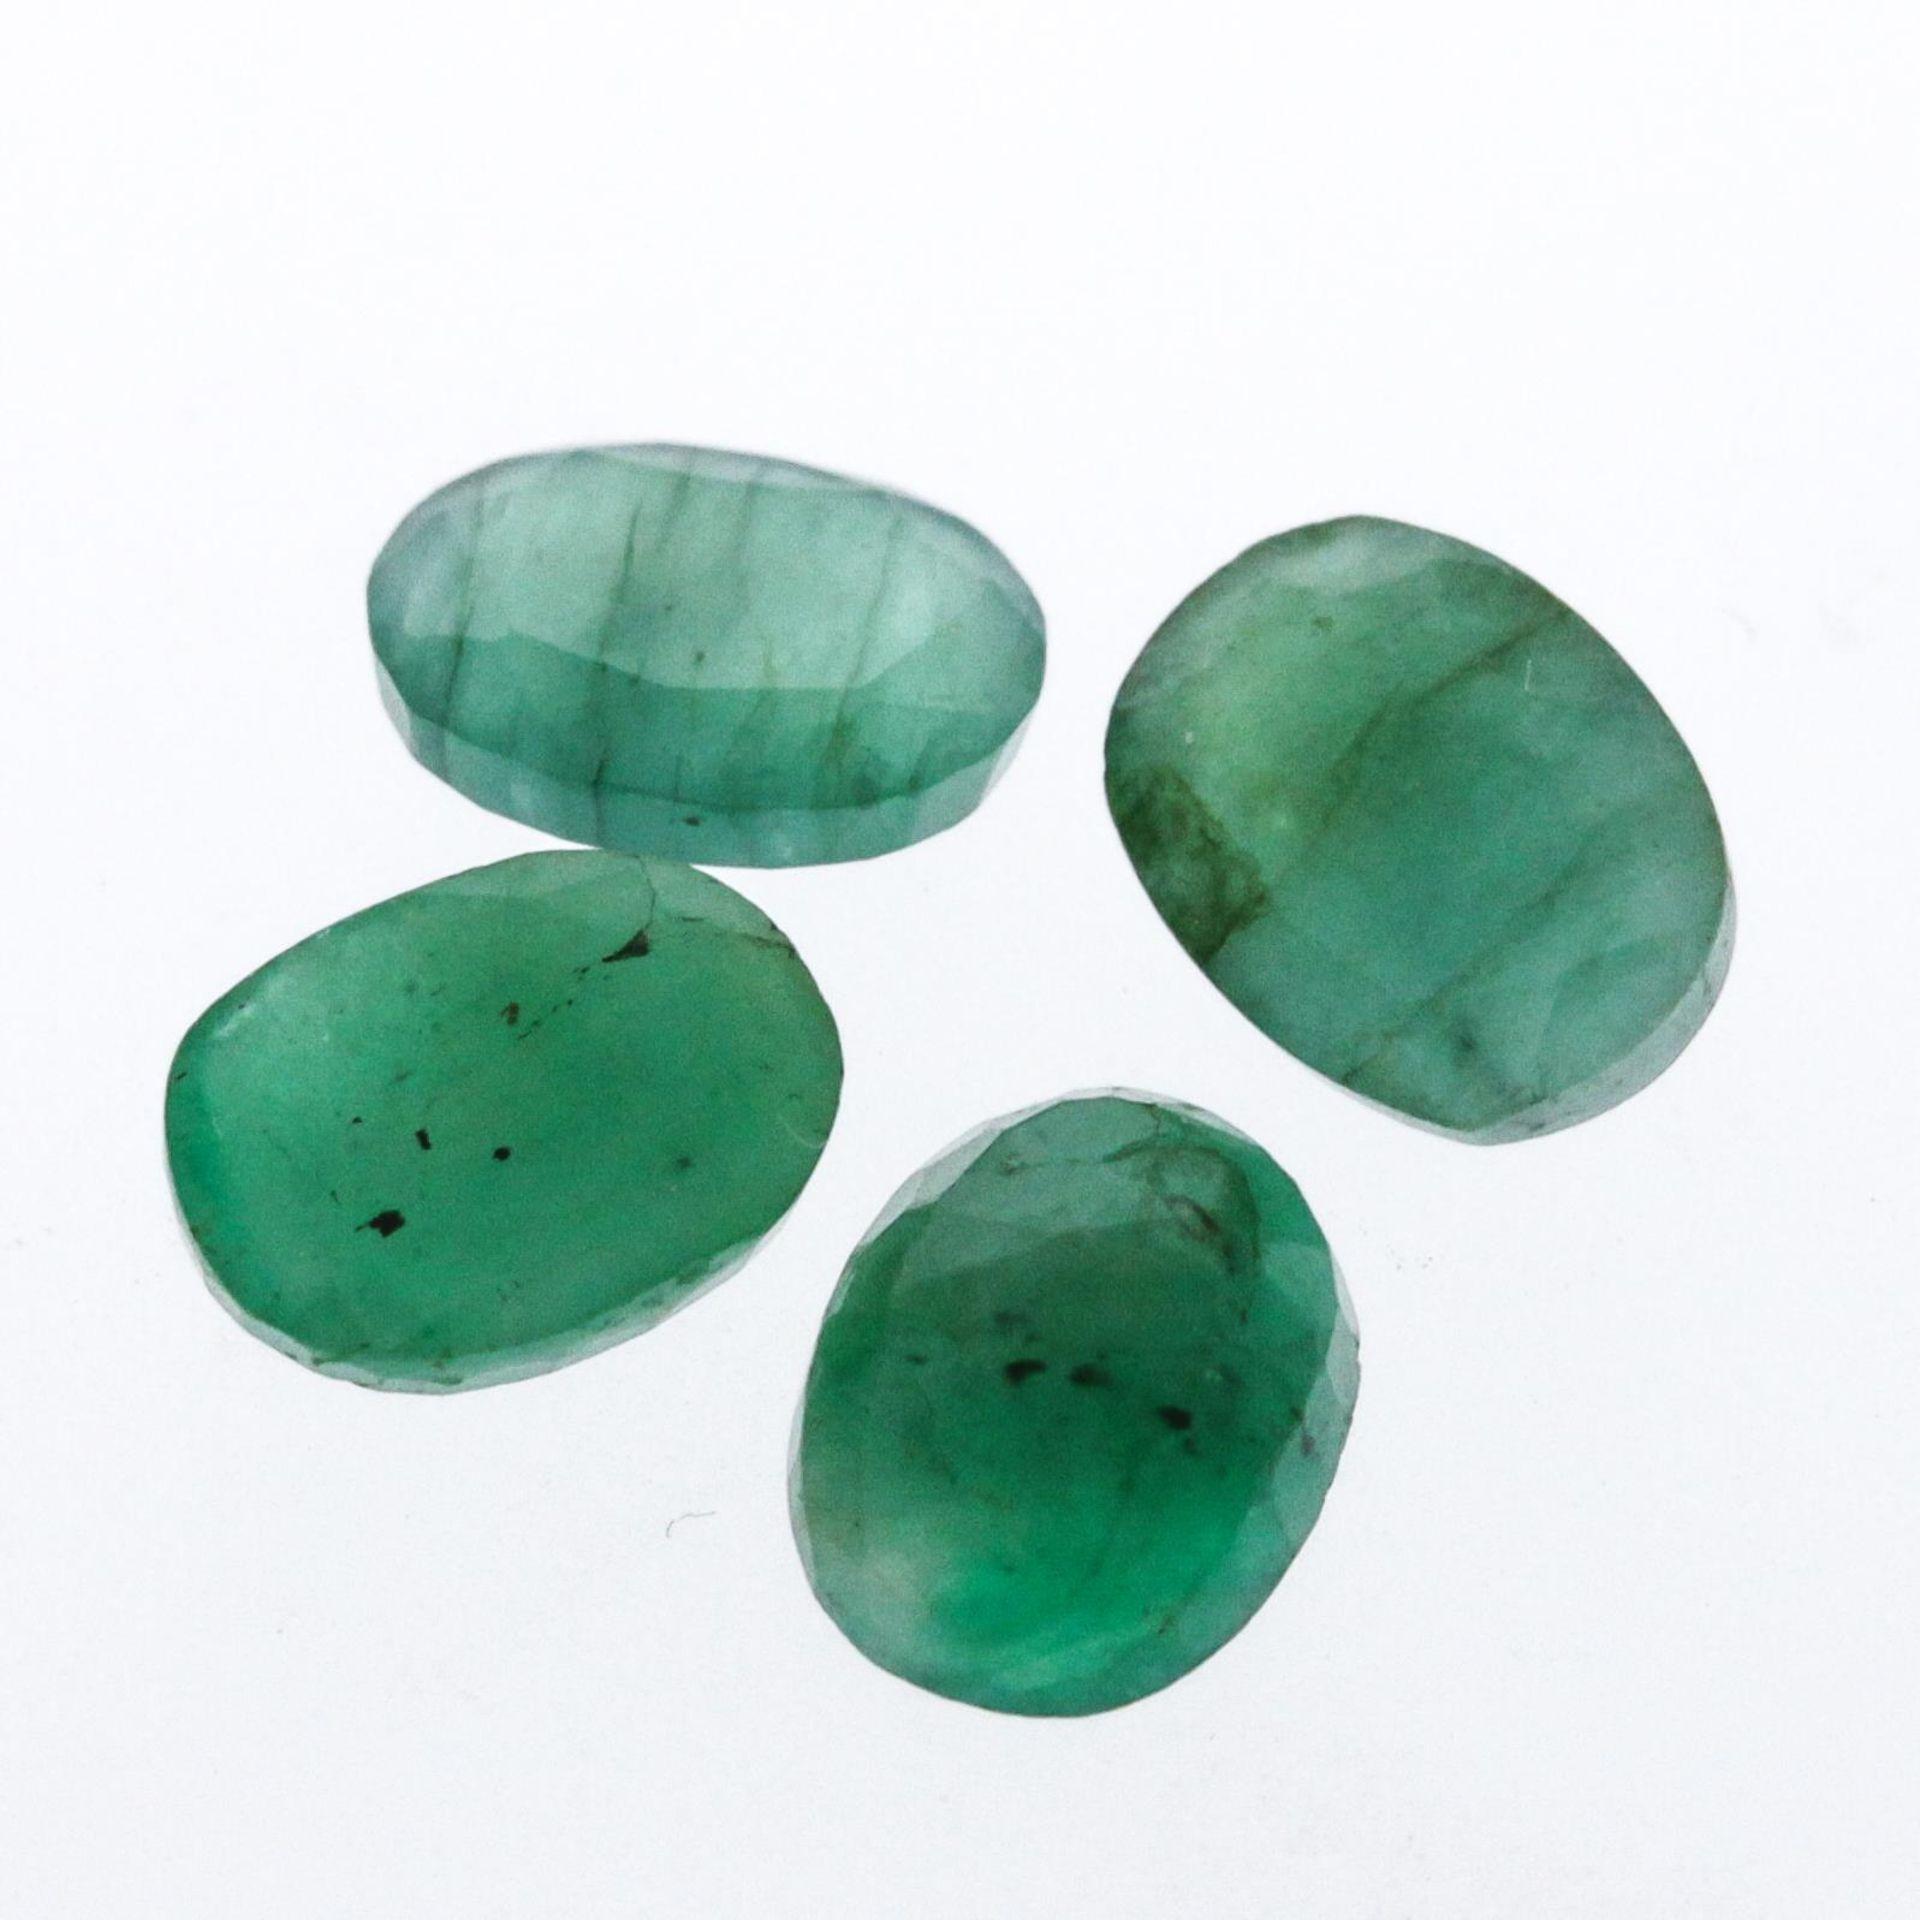 4.85cts. Oval Cut Natural Emerald Parcel